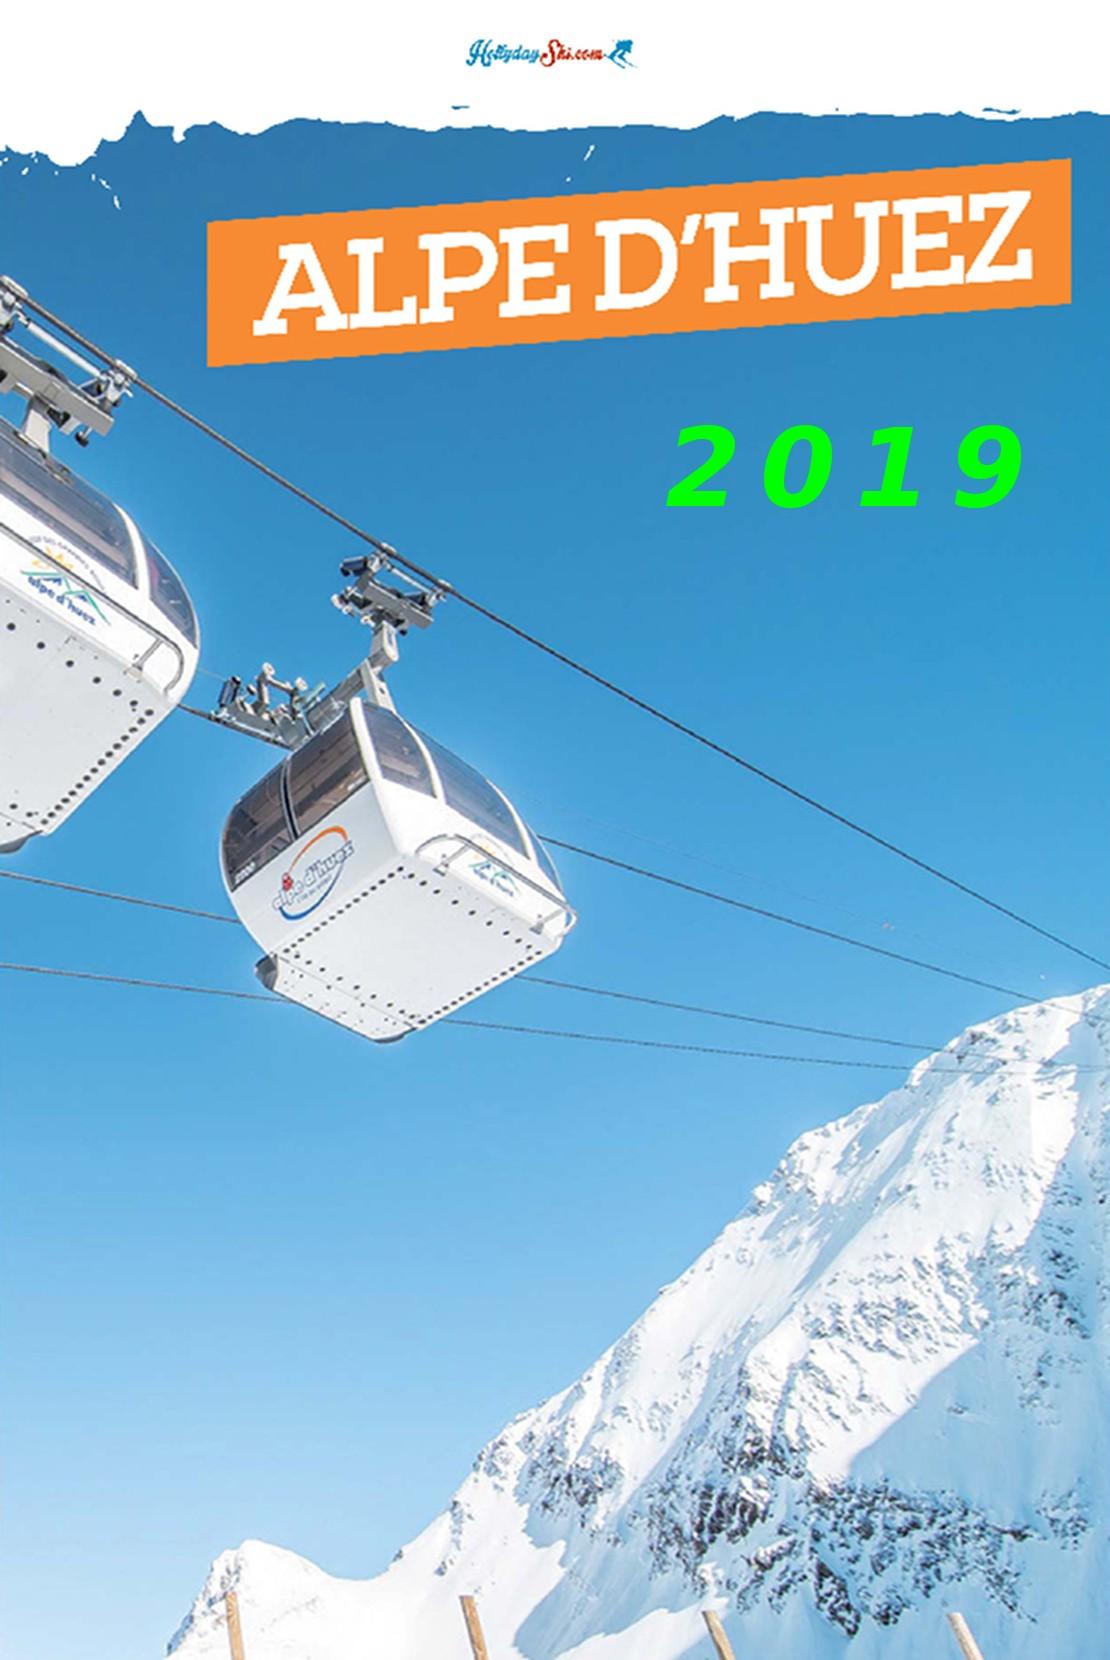 ALPE D'HUEZ 2019